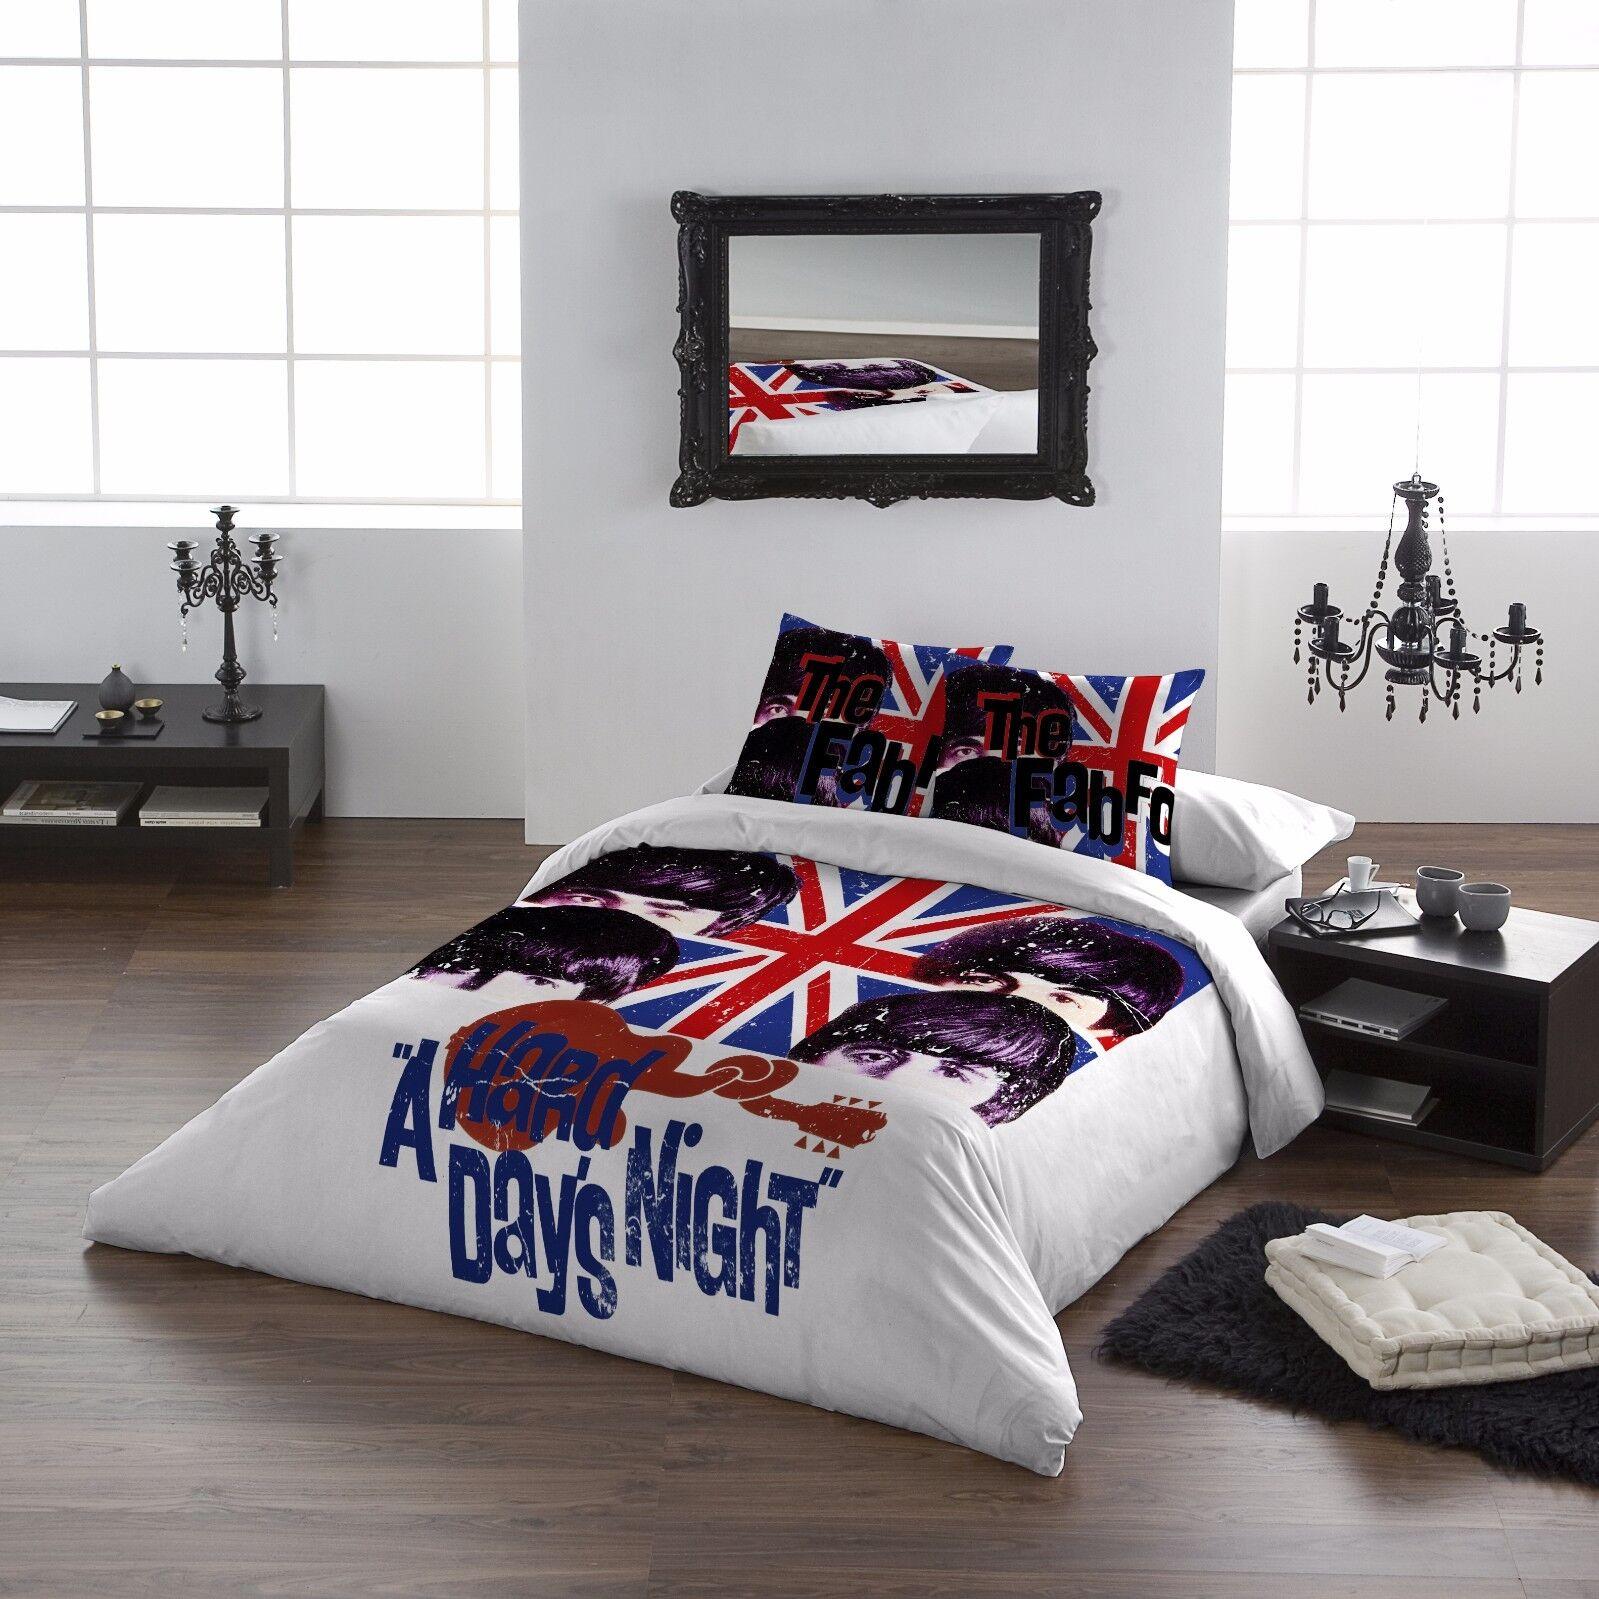 The Beatles HARD DAYS NIGHT - Duvet Cover and Pillowcase Set   UK KingGröße